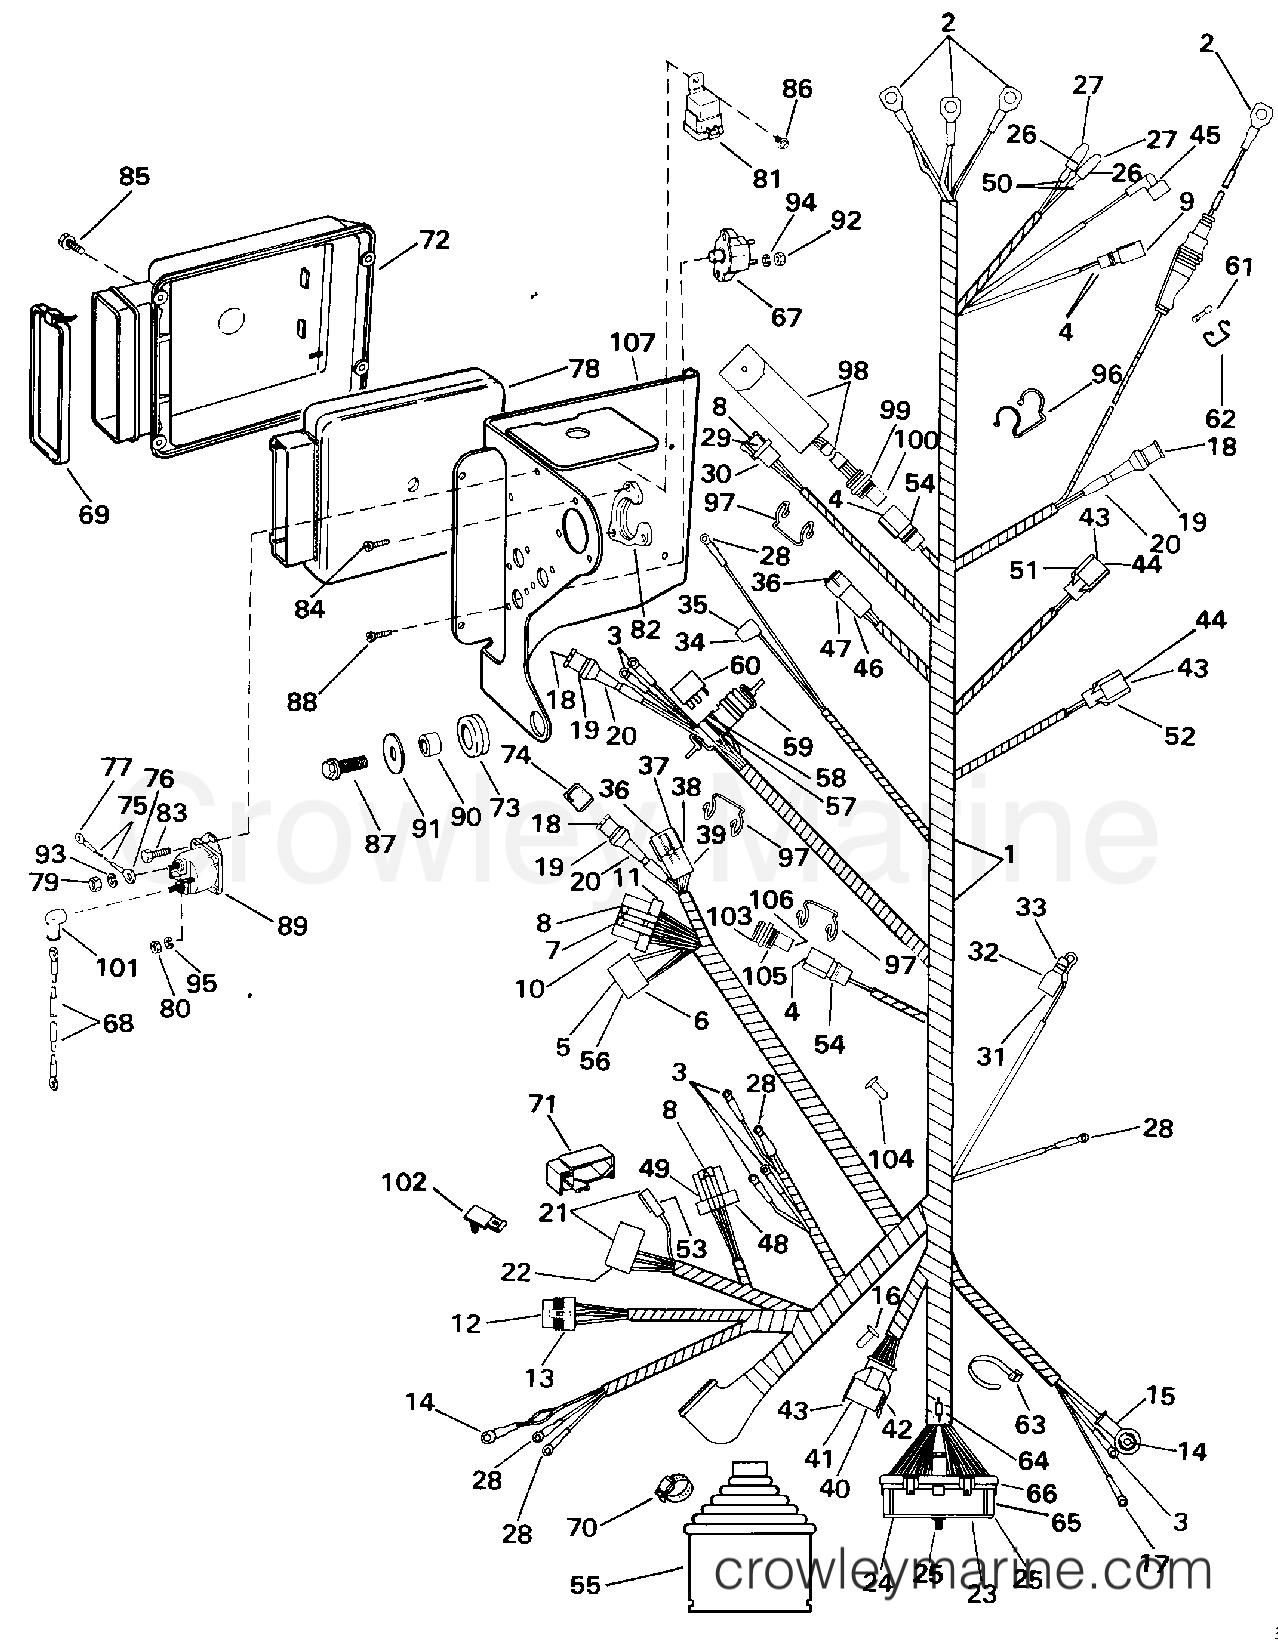 1994 OMC Stern Drive 5.8 - 58FAGPMDM - ENGINE WIRE HARNESS & BRACKET